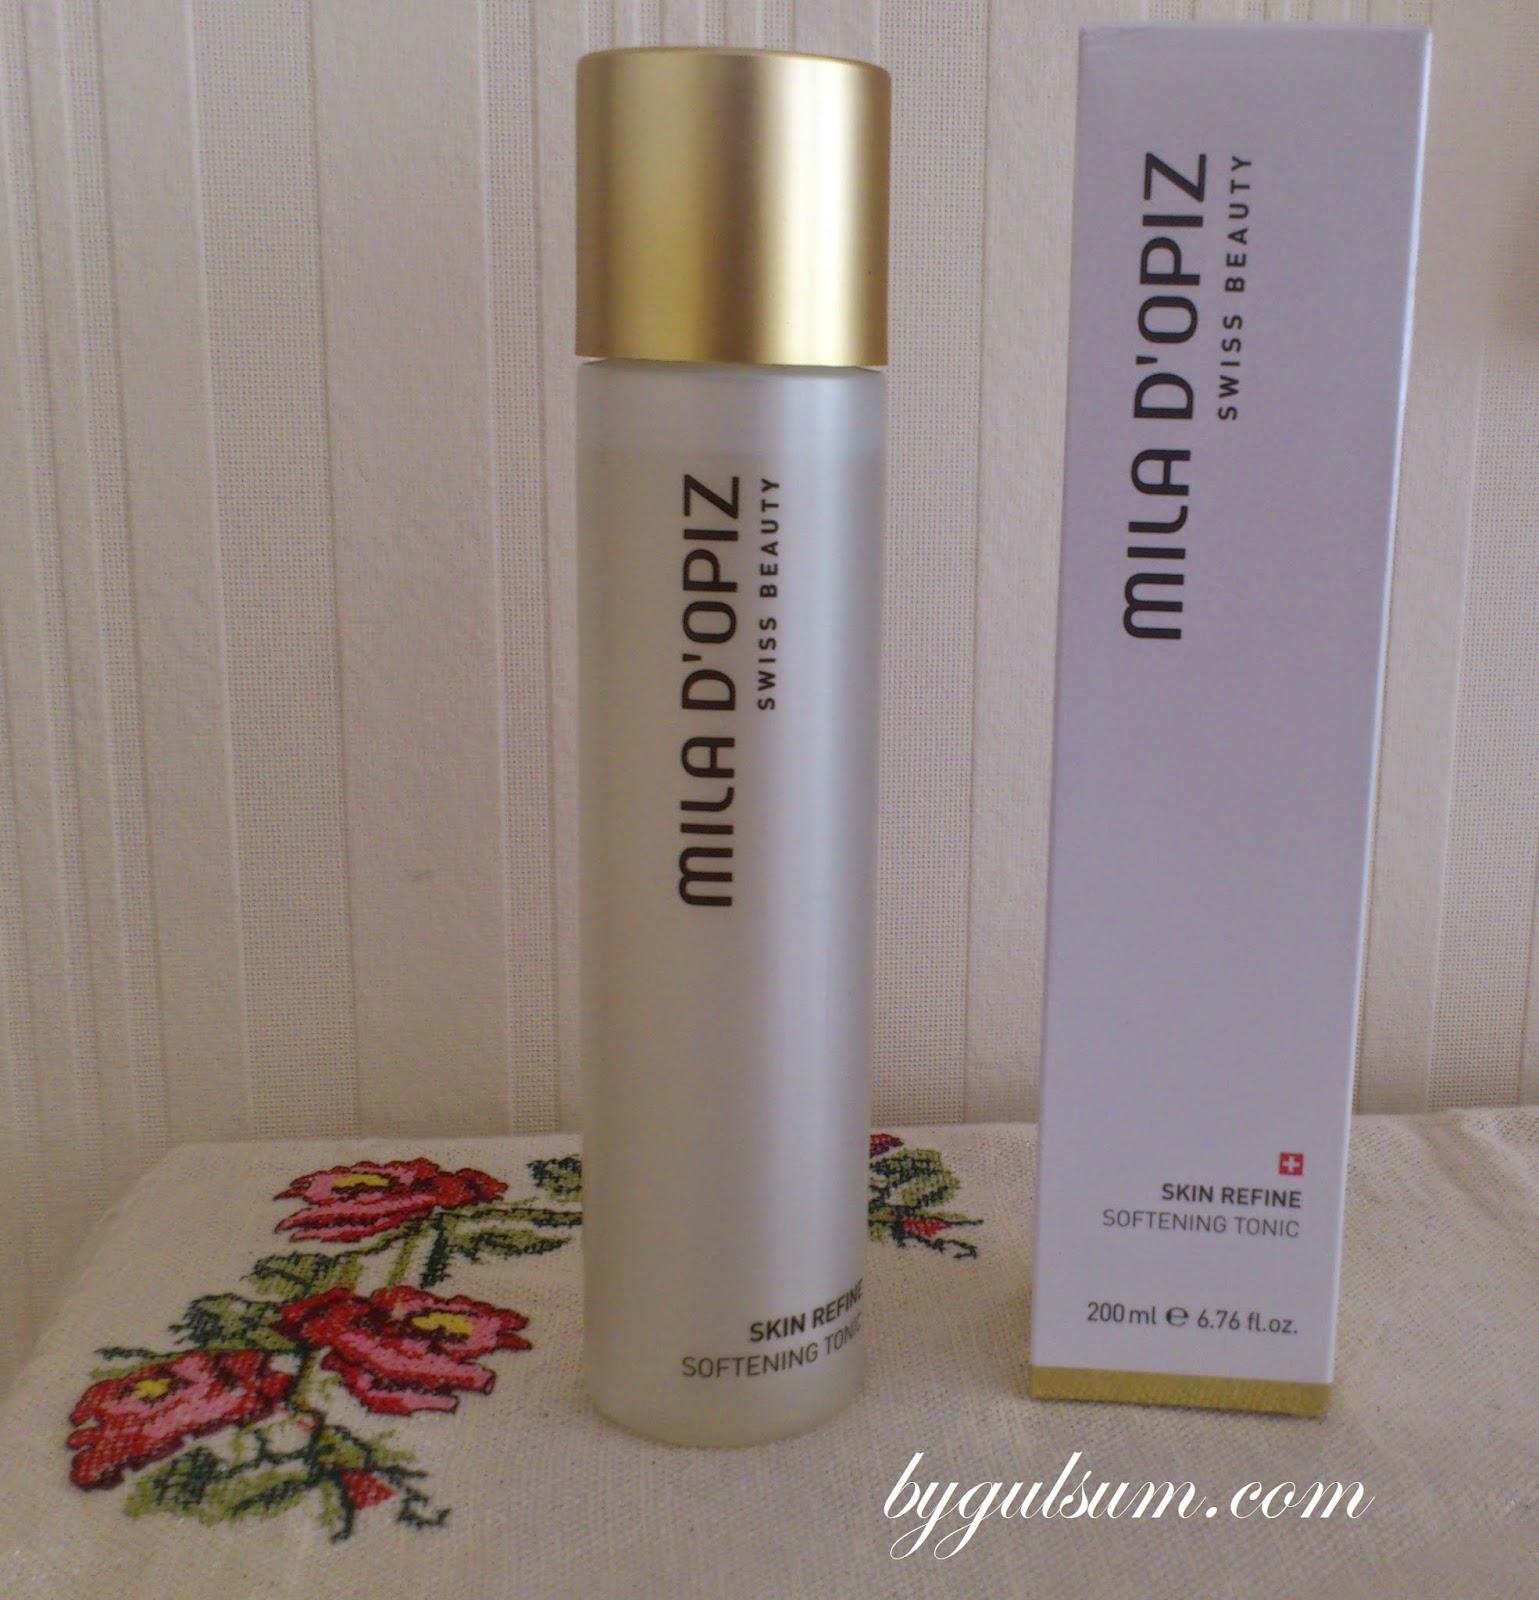 Mila D'Opiz Skin Refine Softening Tonic